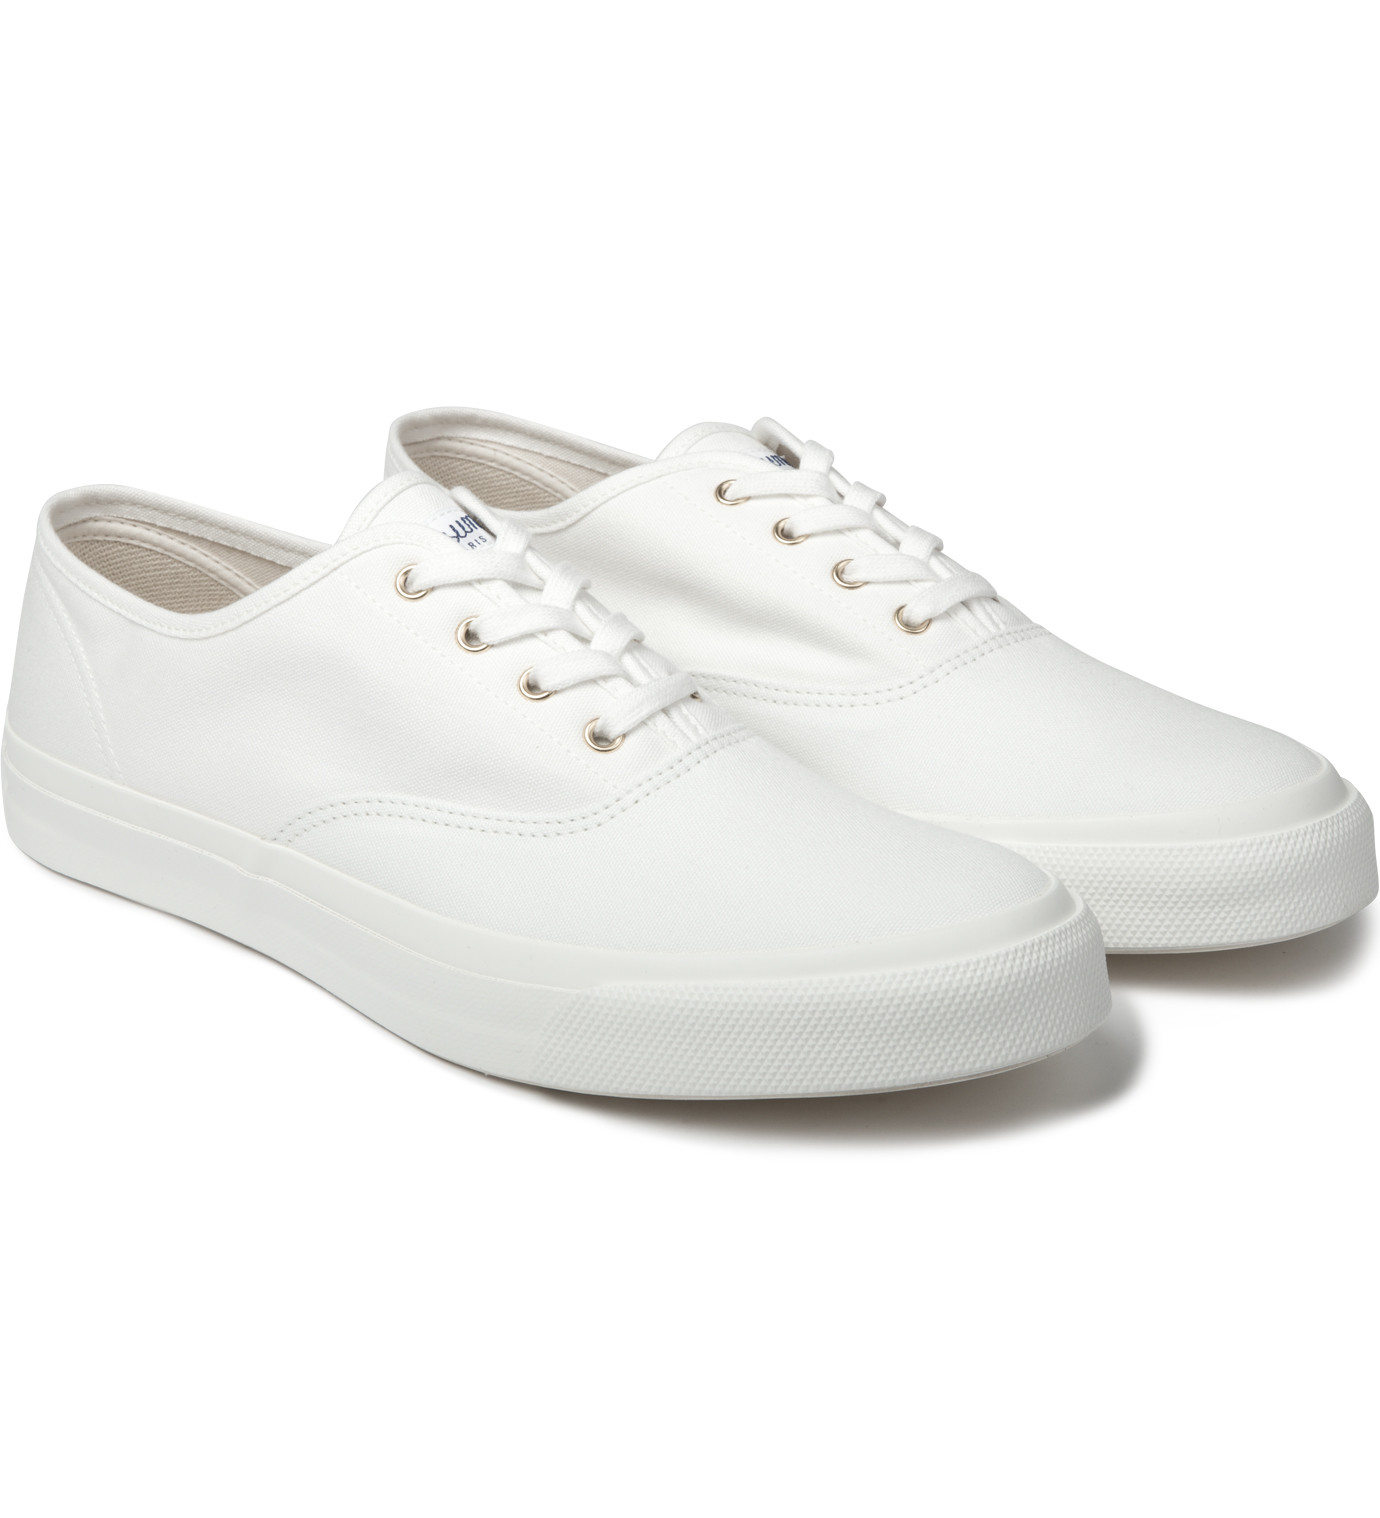 Maison Kitsune - White Canvas Sneakers